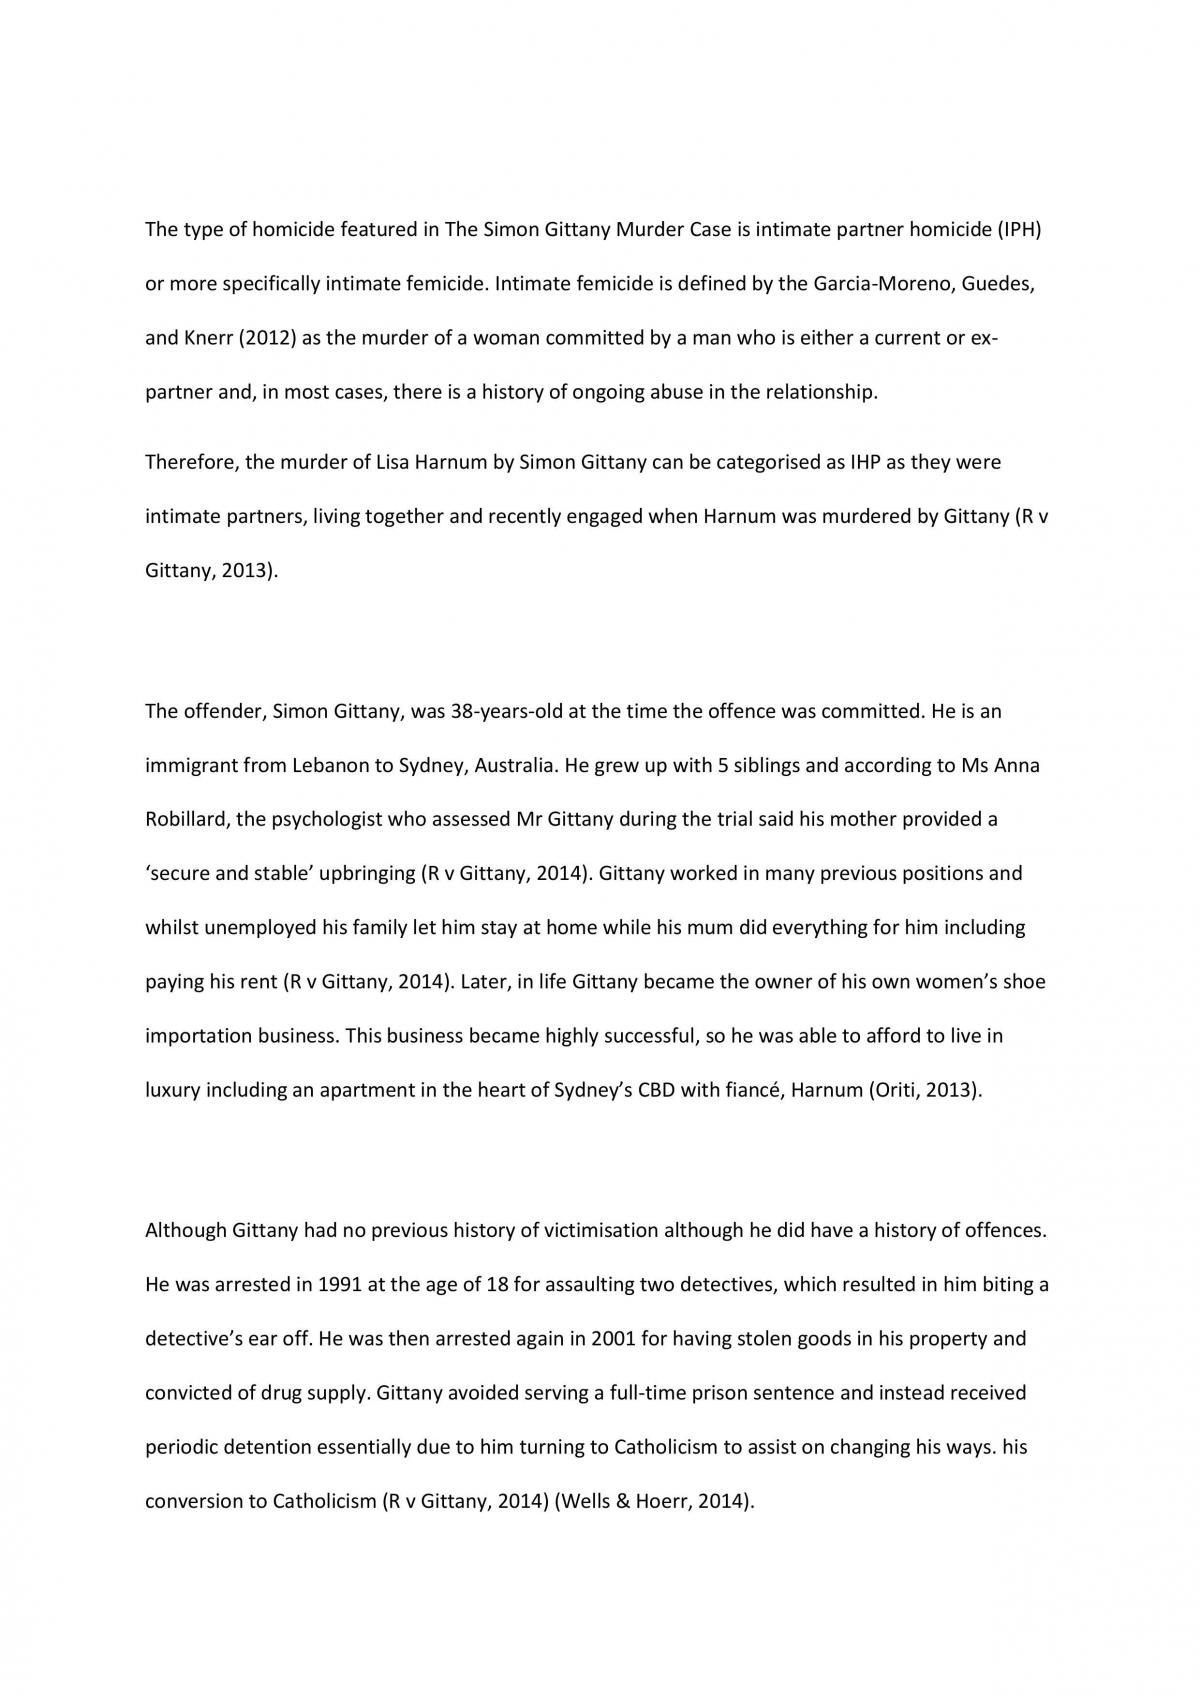 Simon Gittany Case Study - Page 1